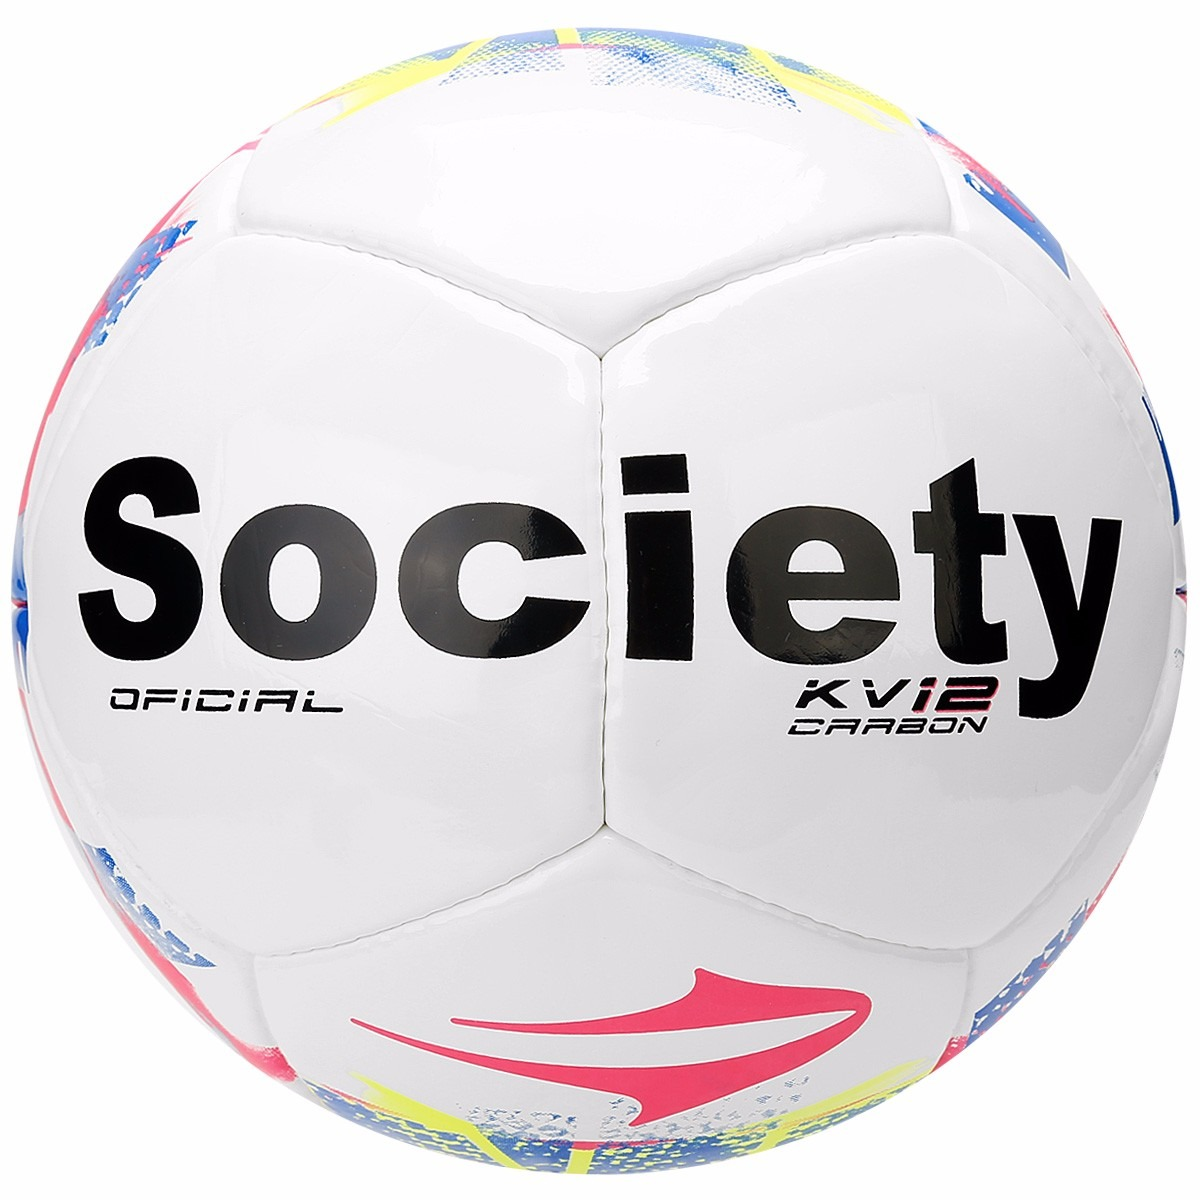 980102f200 Bola Futebol De Society Topper Kv 12 Carbom Grama Sintética - R  94 ...